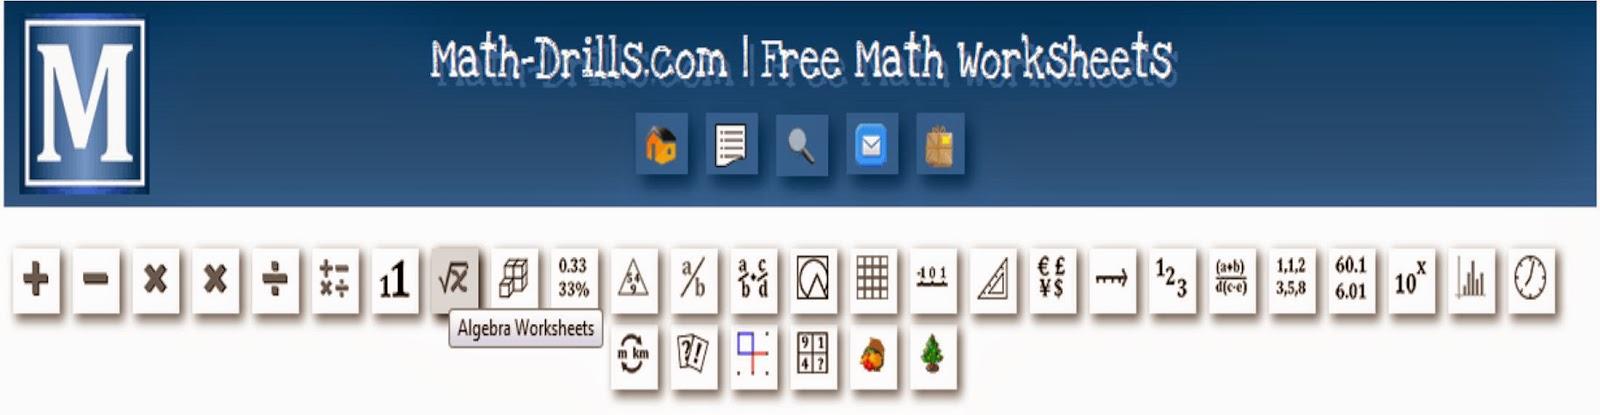 http://www.math-drills.com/